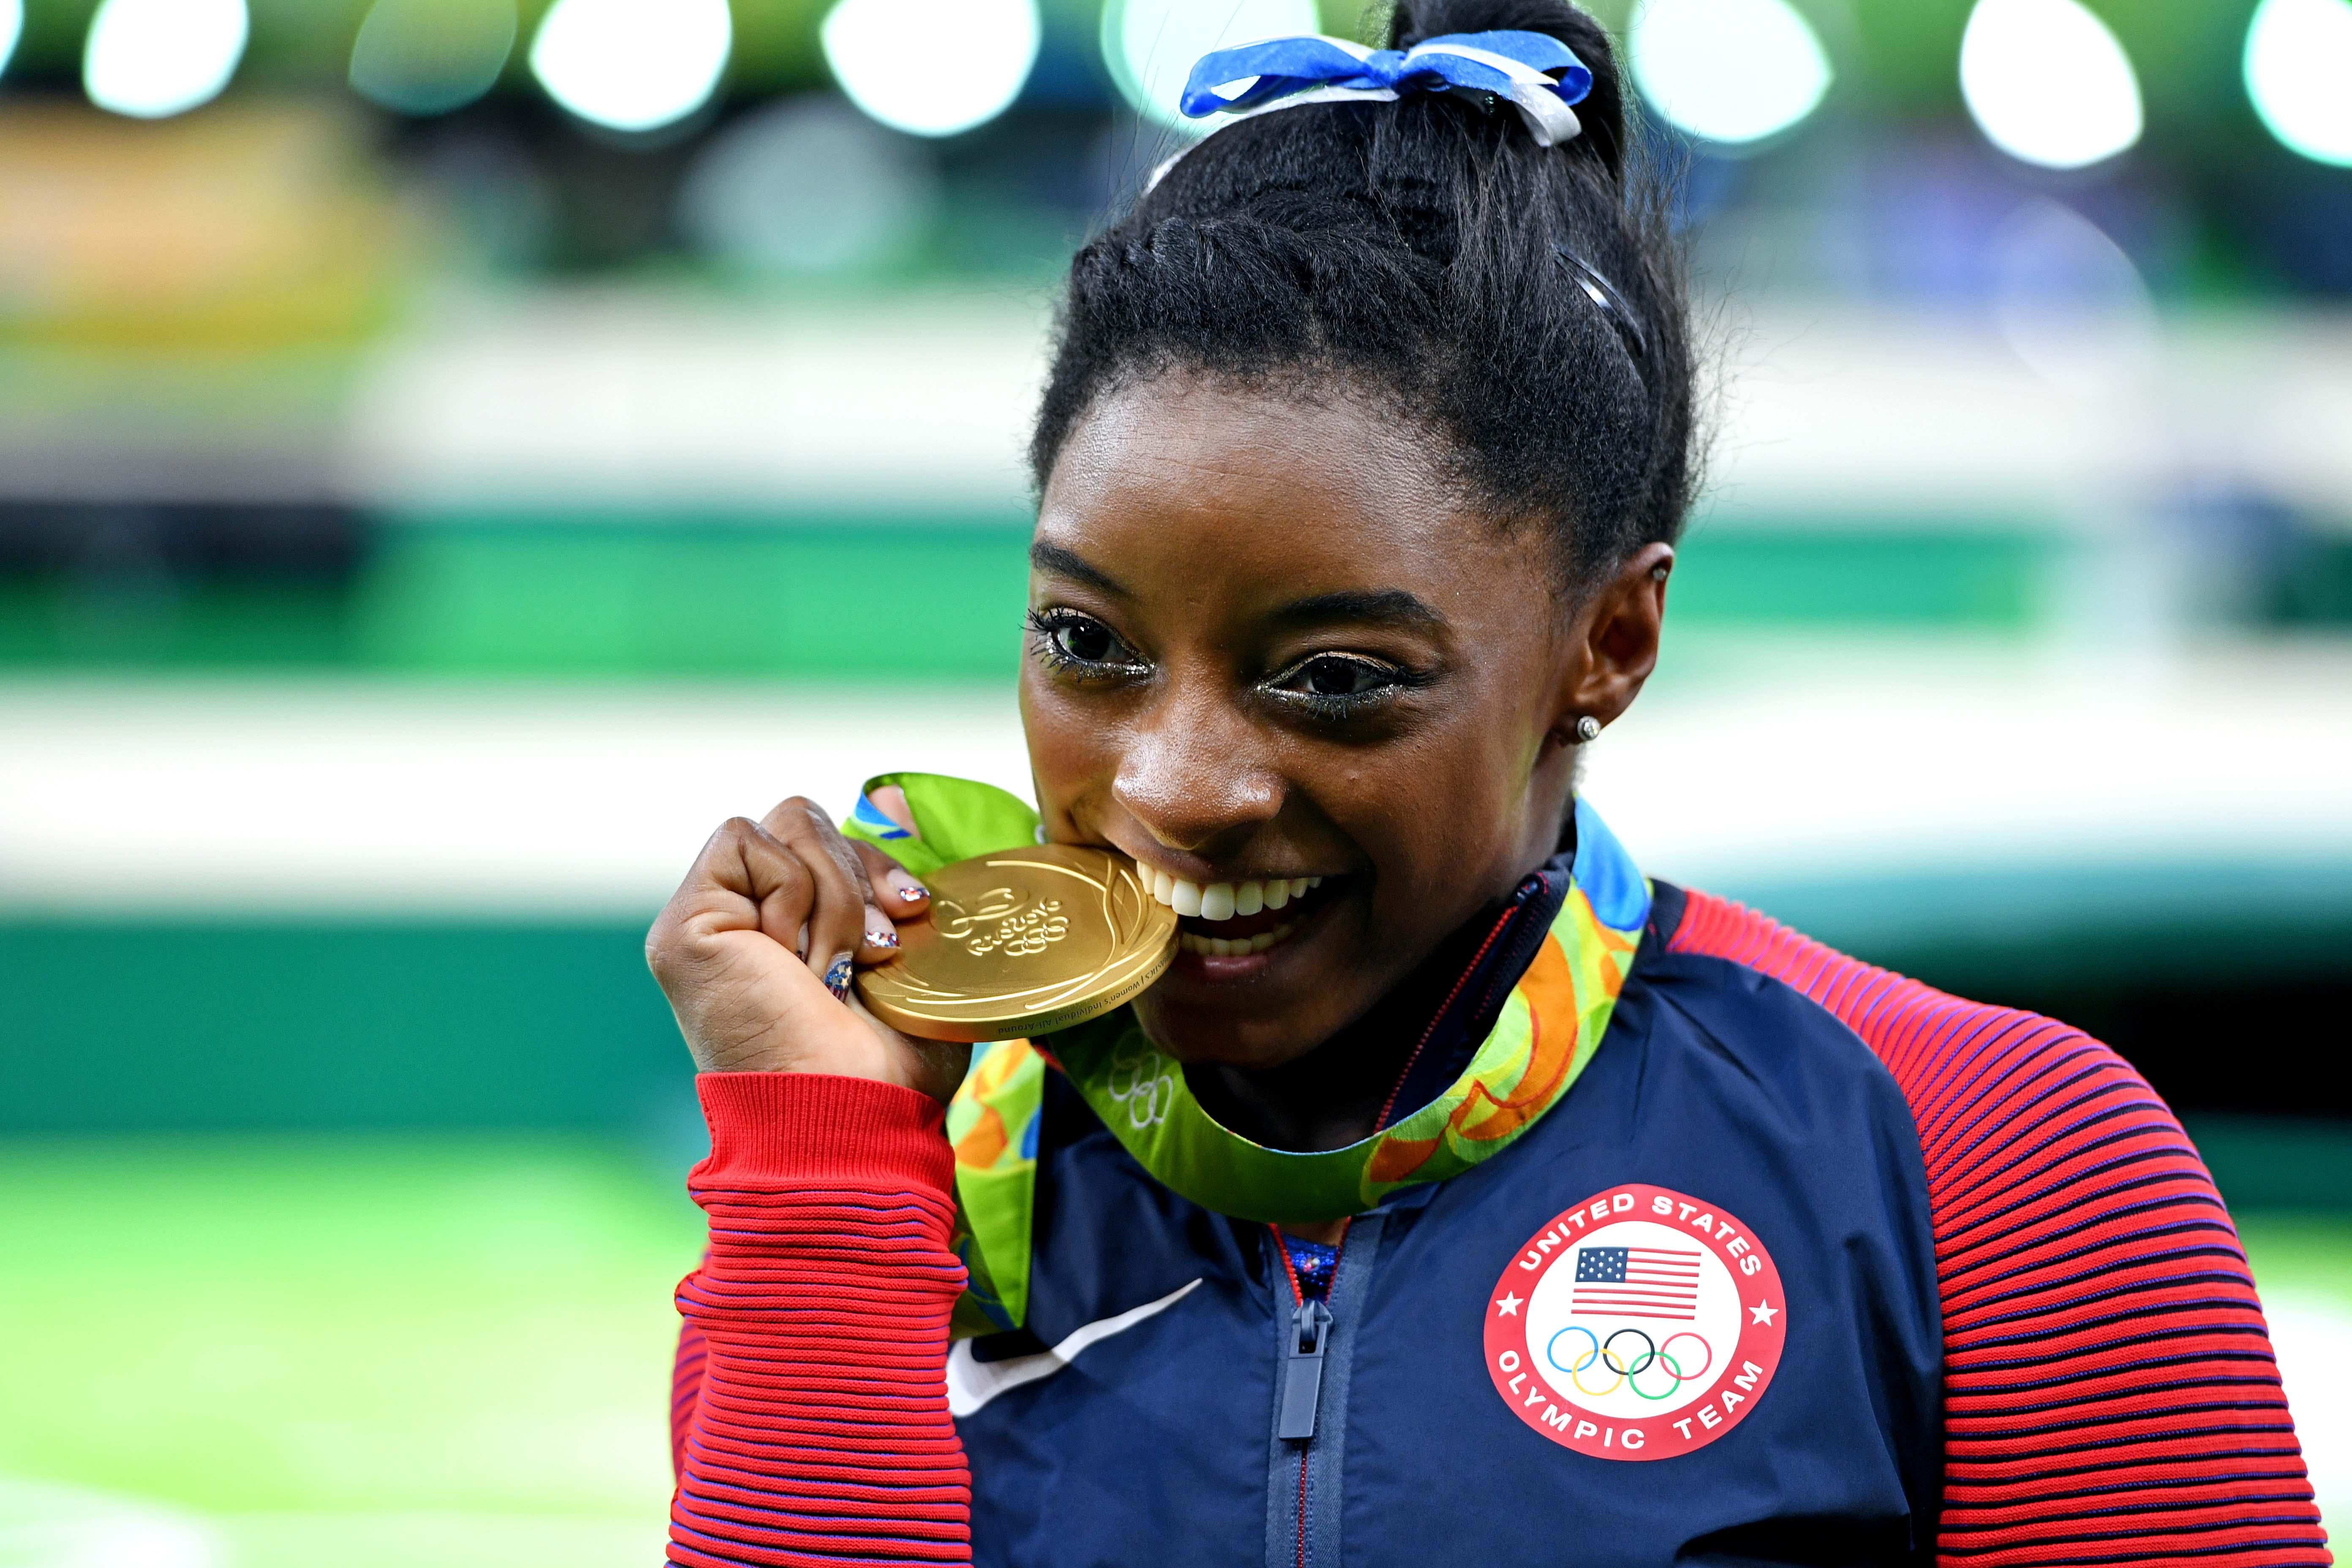 Simone Biles bites an Olympic gold medal in celebration.